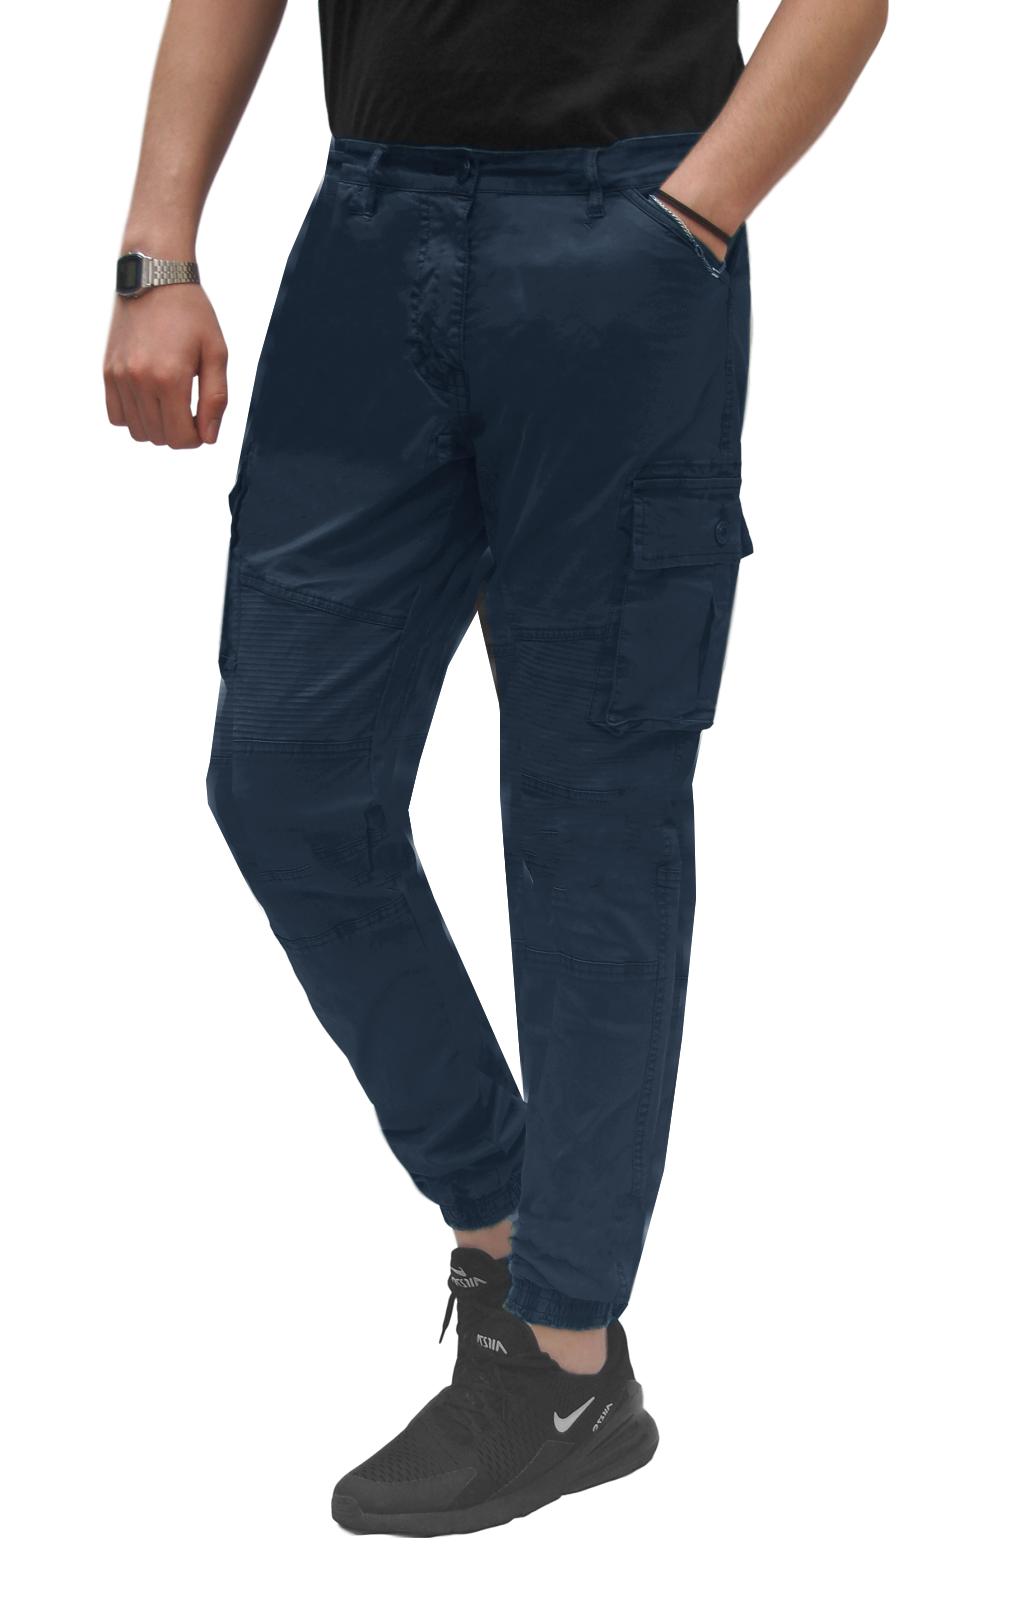 Pantalone-Uomo-Cargo-Con-Tasconi-Invernale-Verde-Blu-Nero-Marrone-Pantaloni-slim miniatura 19